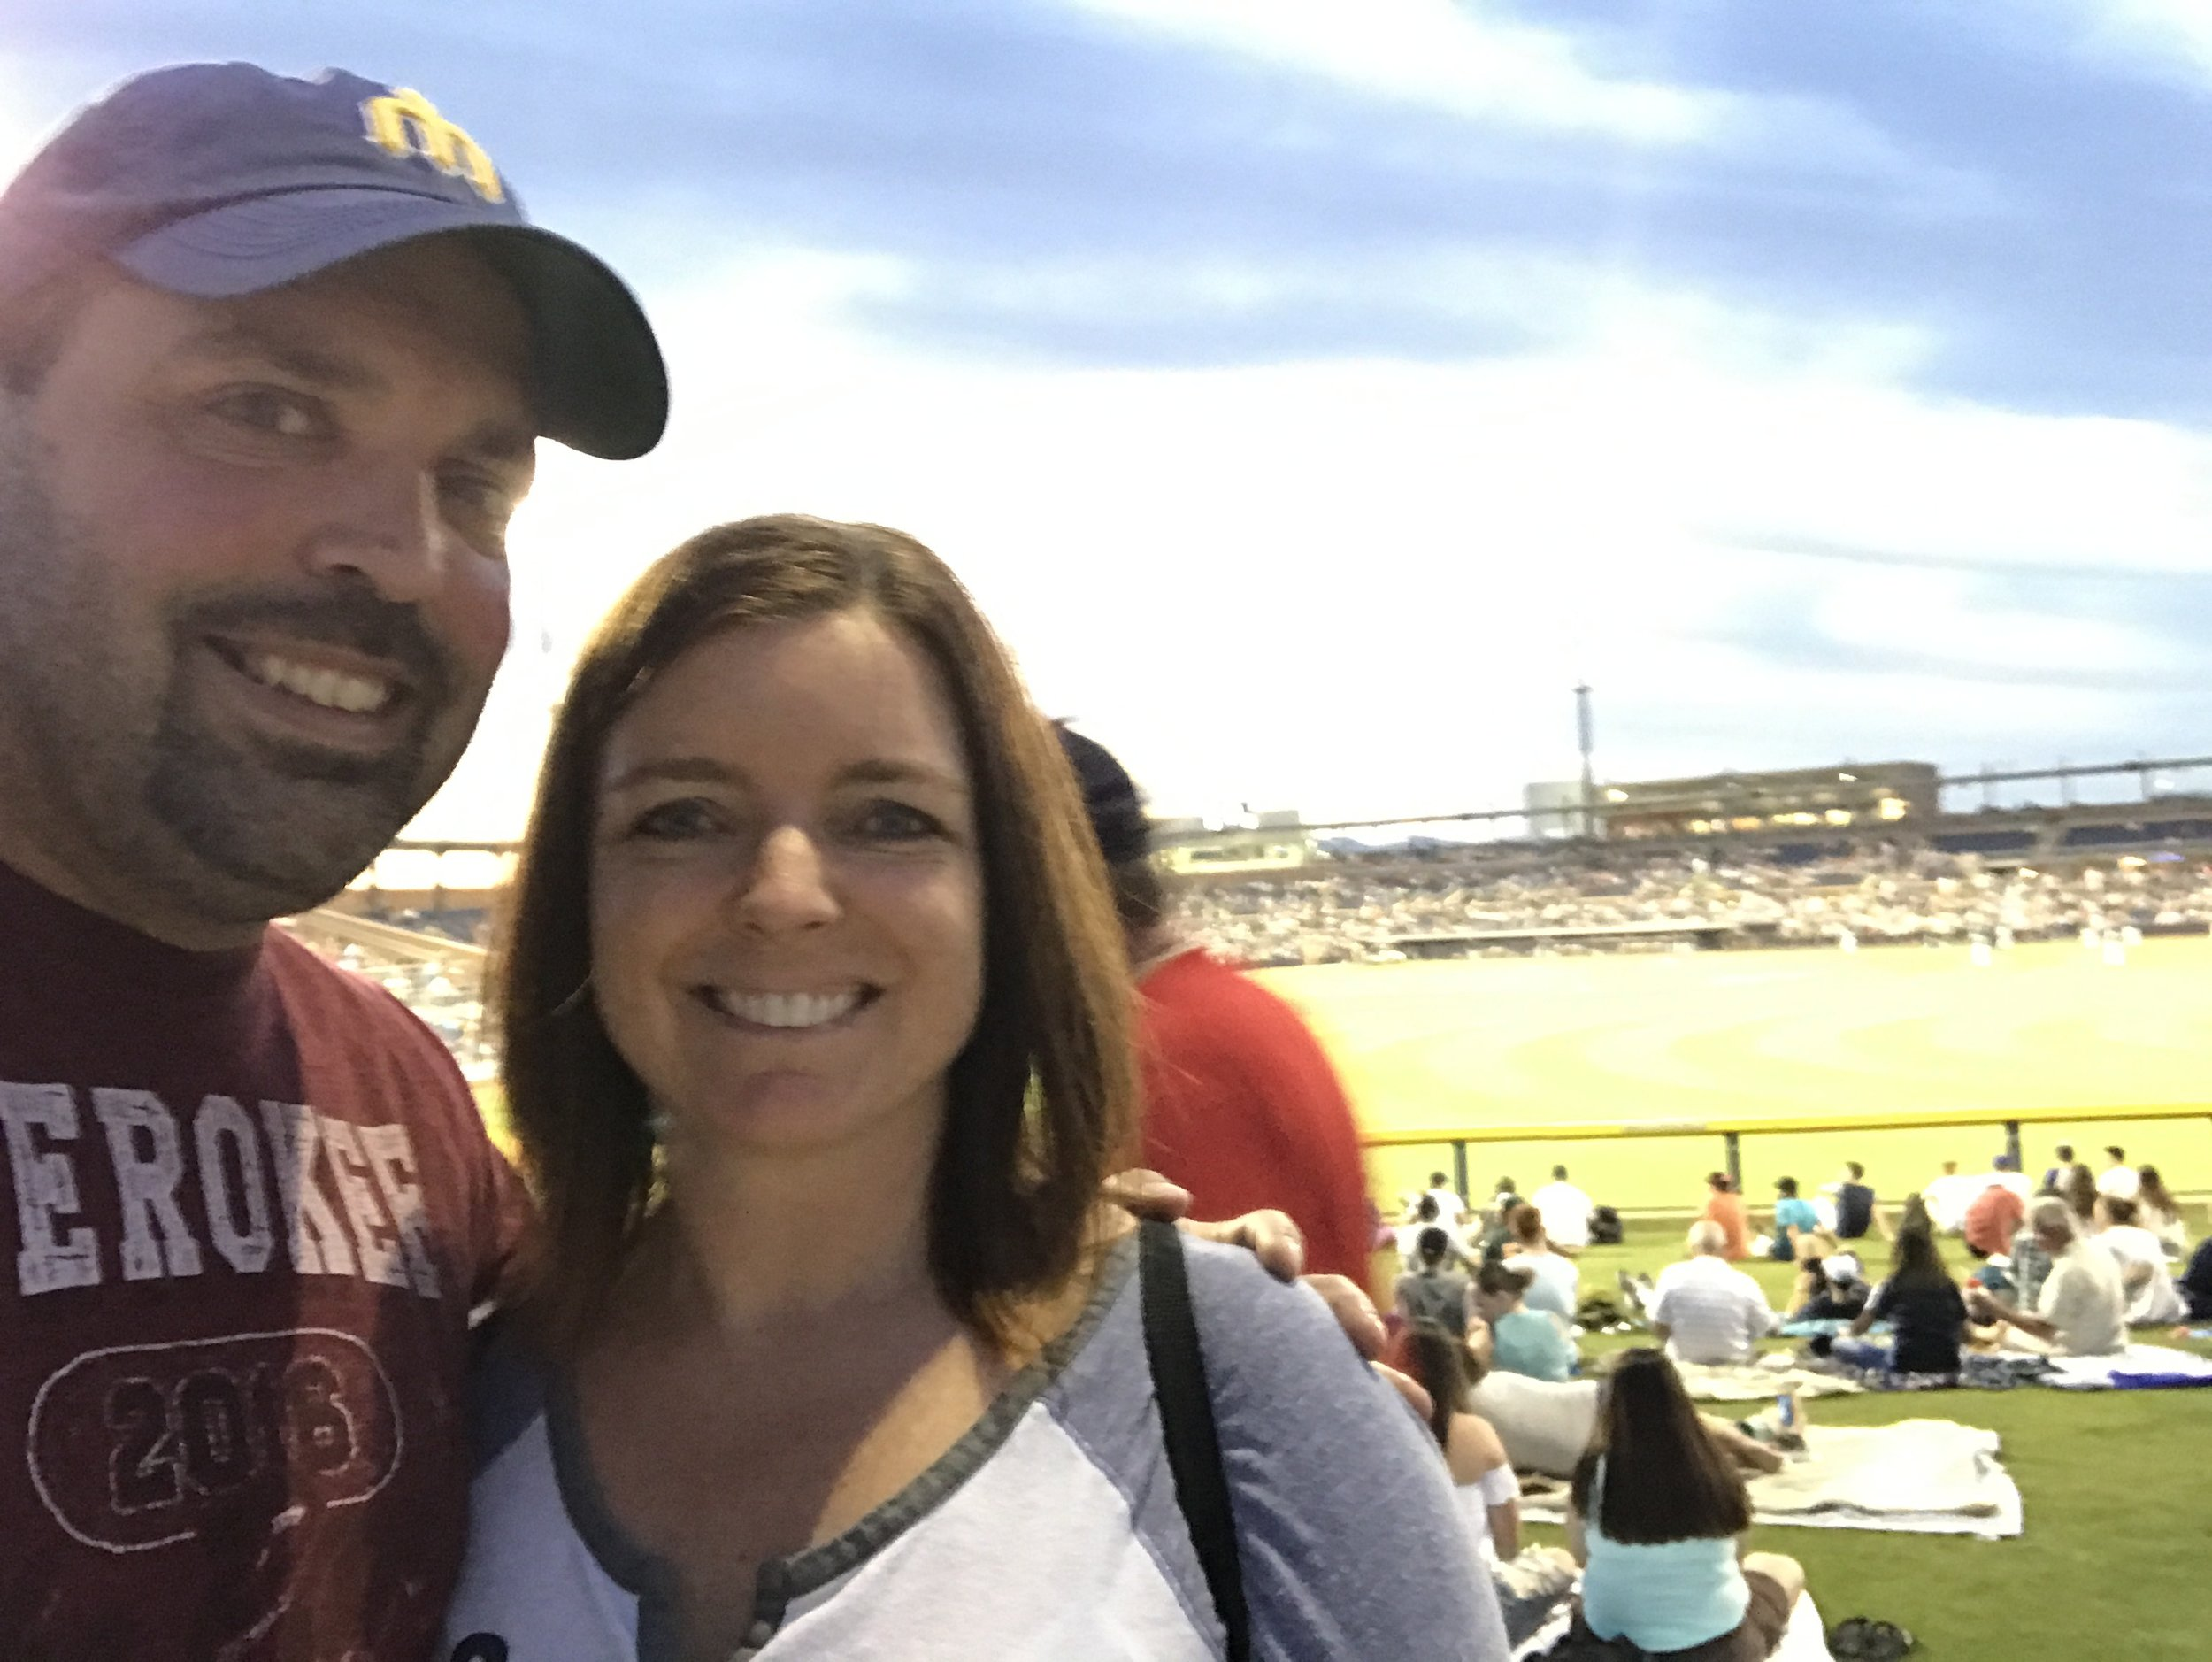 Traci and I had a blast taking in warm, late-night baseball games in Arizona in March.